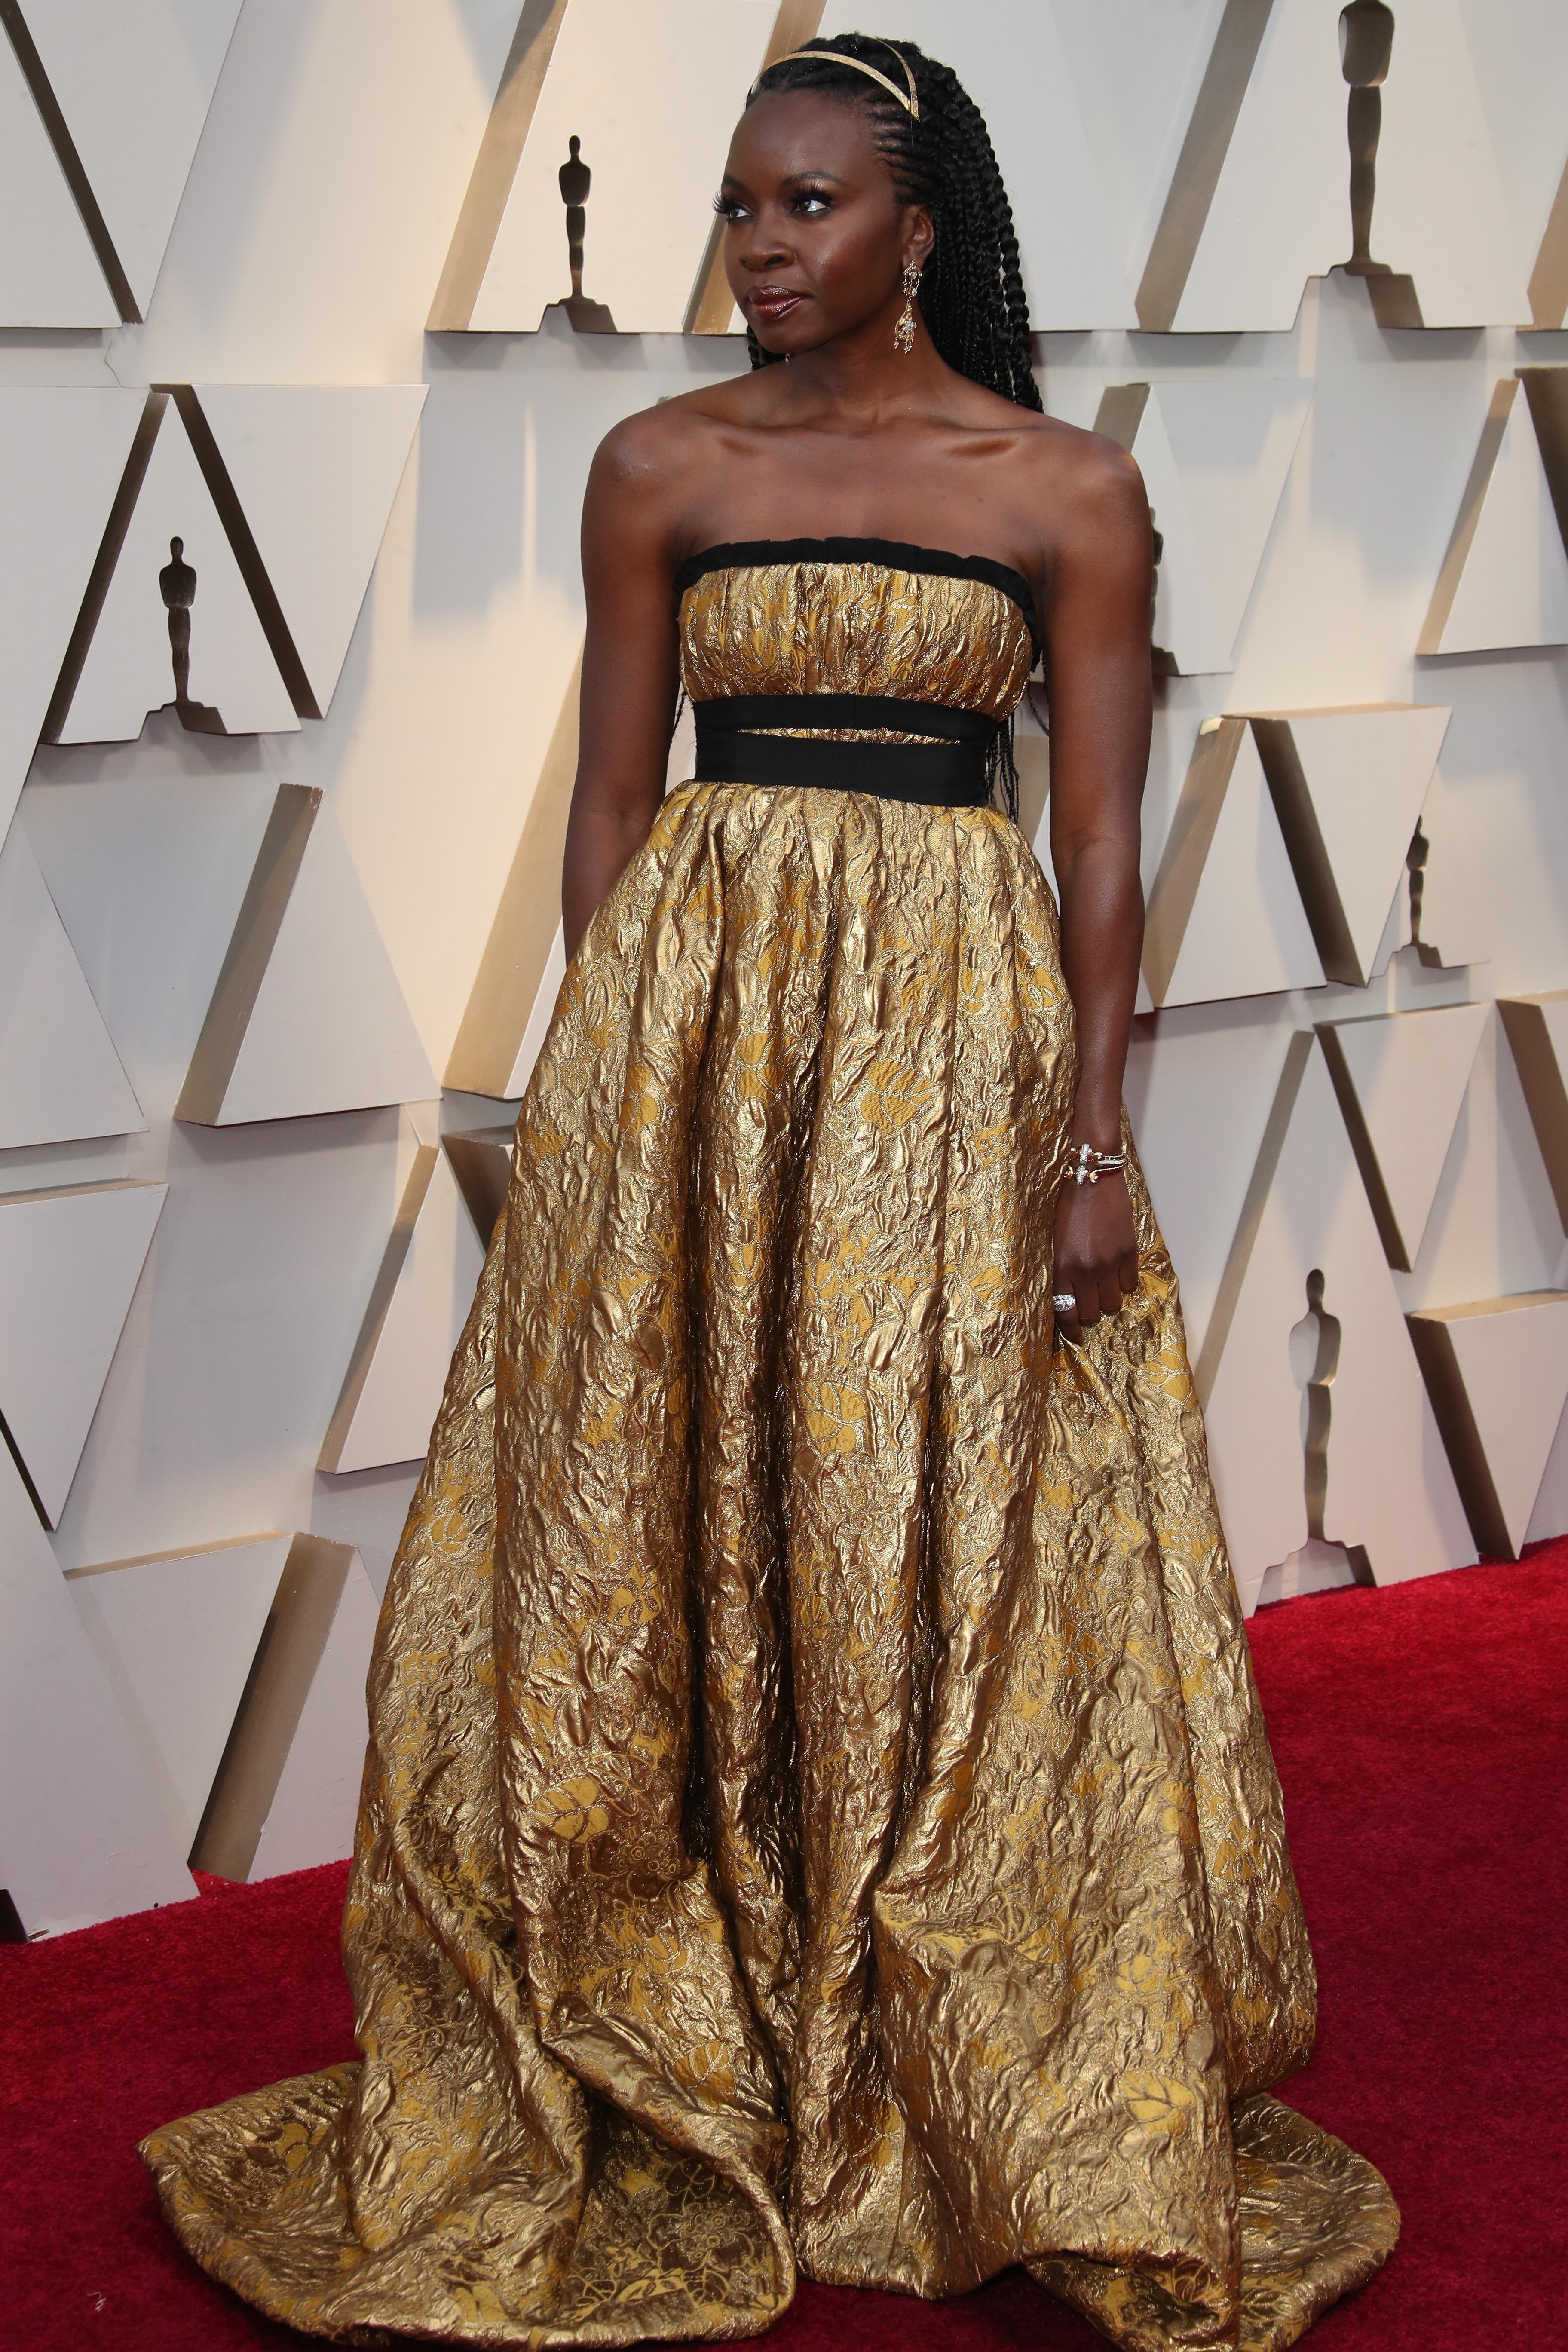 February 24, 2019; Los Angeles, CA, USA; Danai Gurira arrives at the 91st Academy Awards at the Dolby Theatre. Mandatory Credit: Dan MacMedan-USA TODAY NETWORK